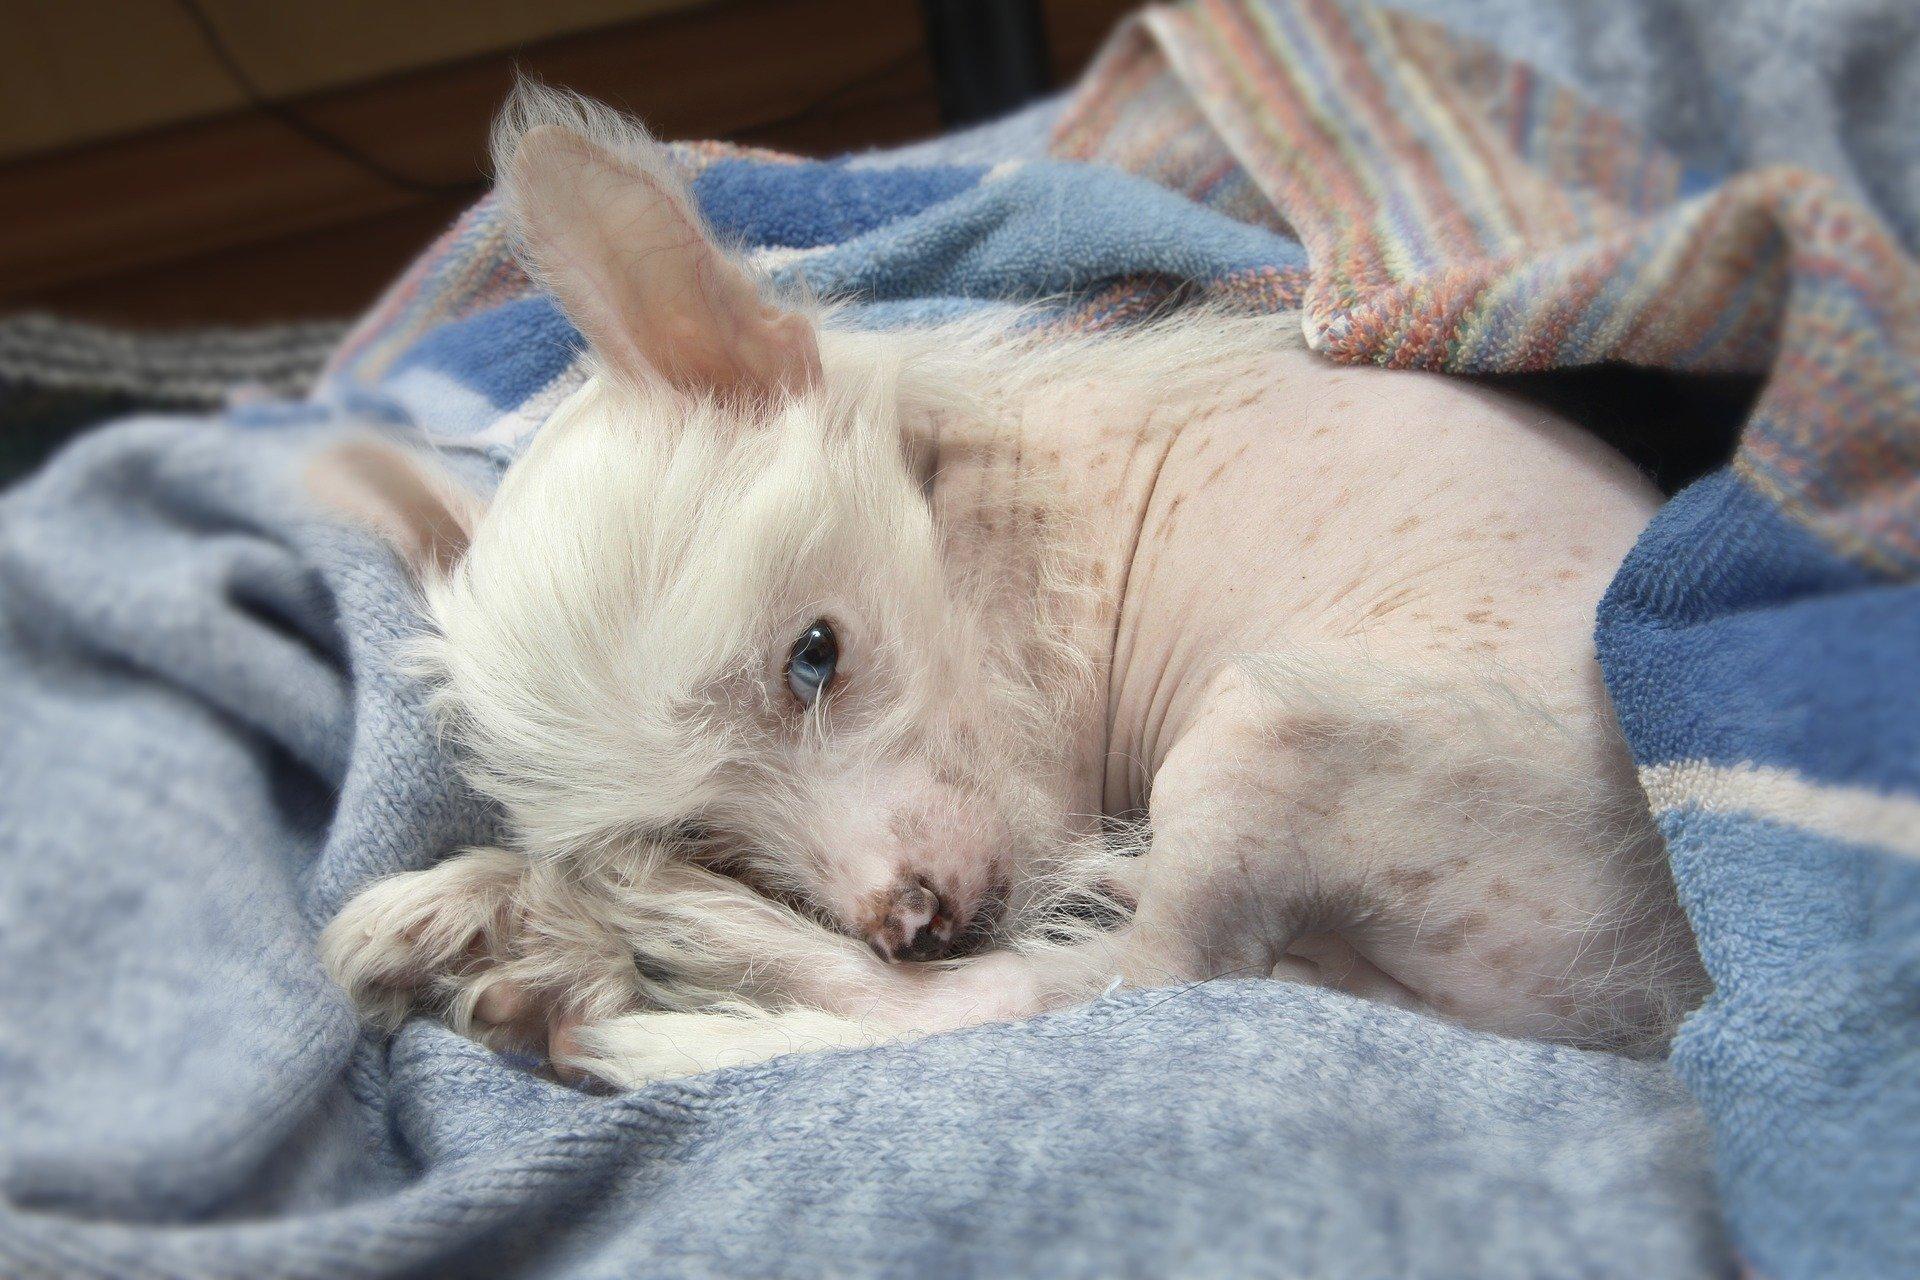 Razze di cani: tutte le razze di cani senza pelo